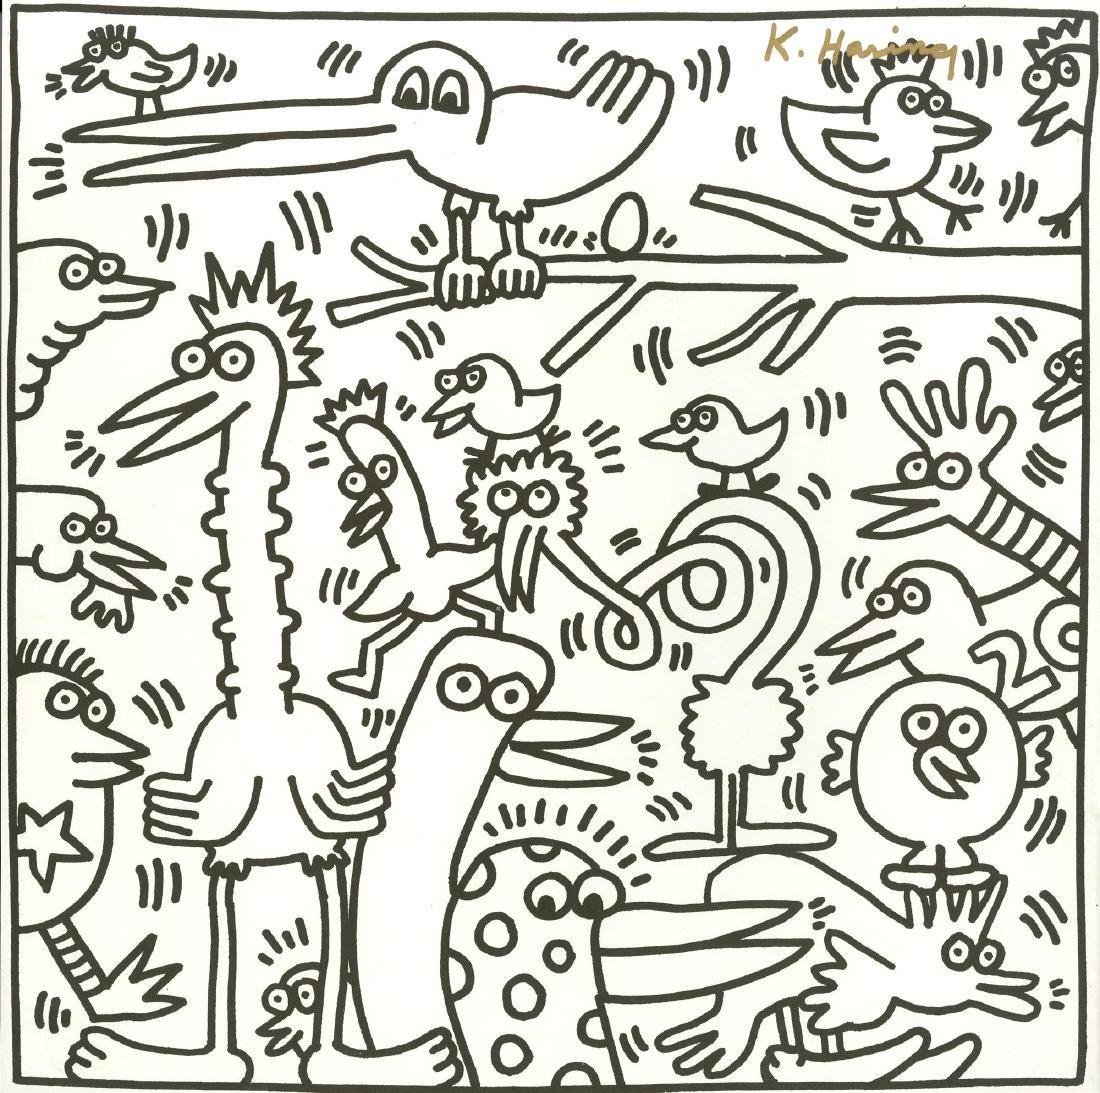 685: KEITH HARING - Twenty Birds